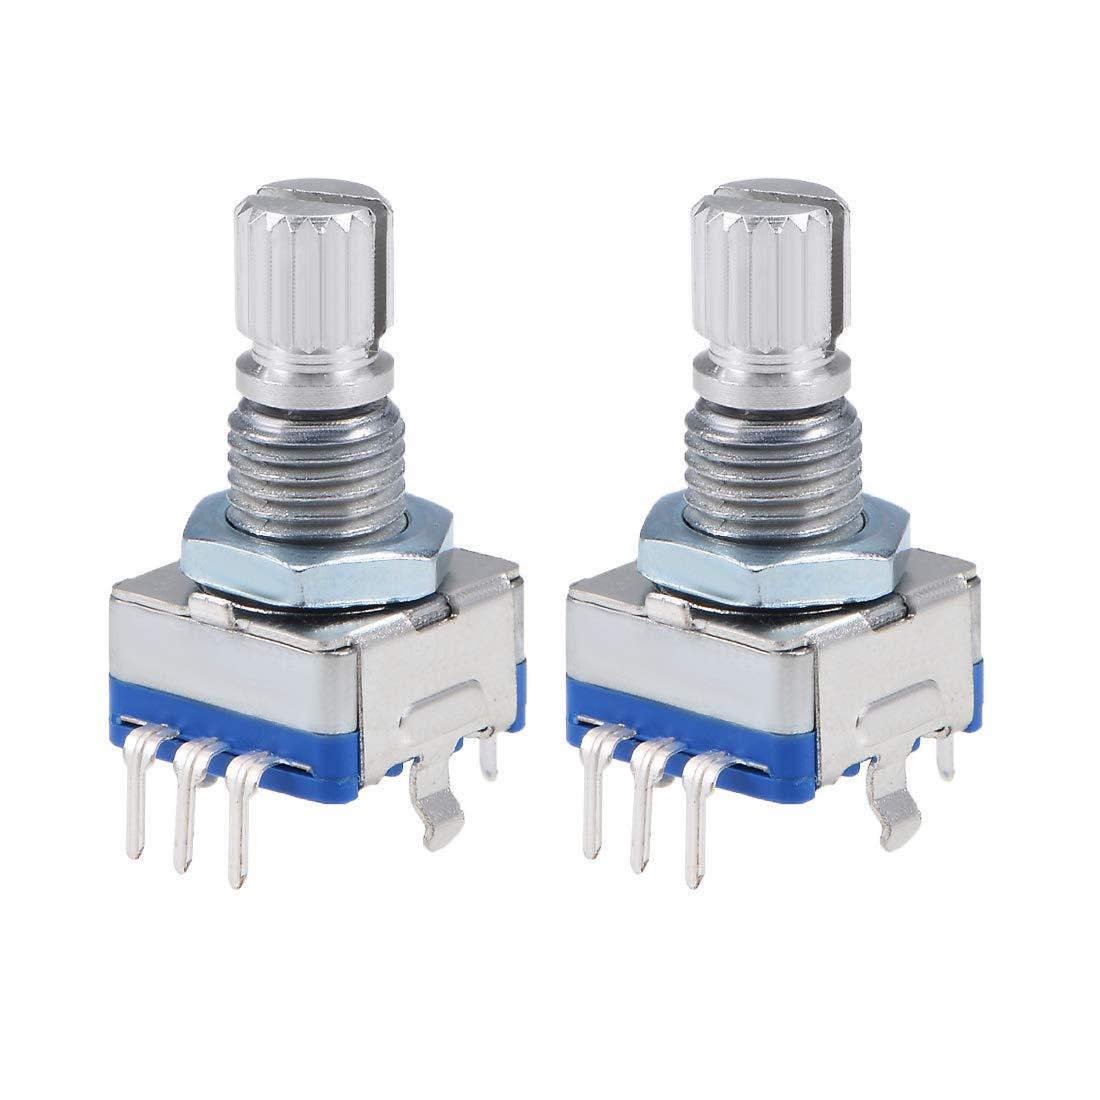 NAND FLash Programmer Adapter ALLSOCKET IC SOCKET//IC Test Socket Customized Reader for 0.4mm,0.5mm,0.65mm,0.8mm,1.0mm or Irregular Pitch Full Pins Socket BGA612,0.4MM Pitch